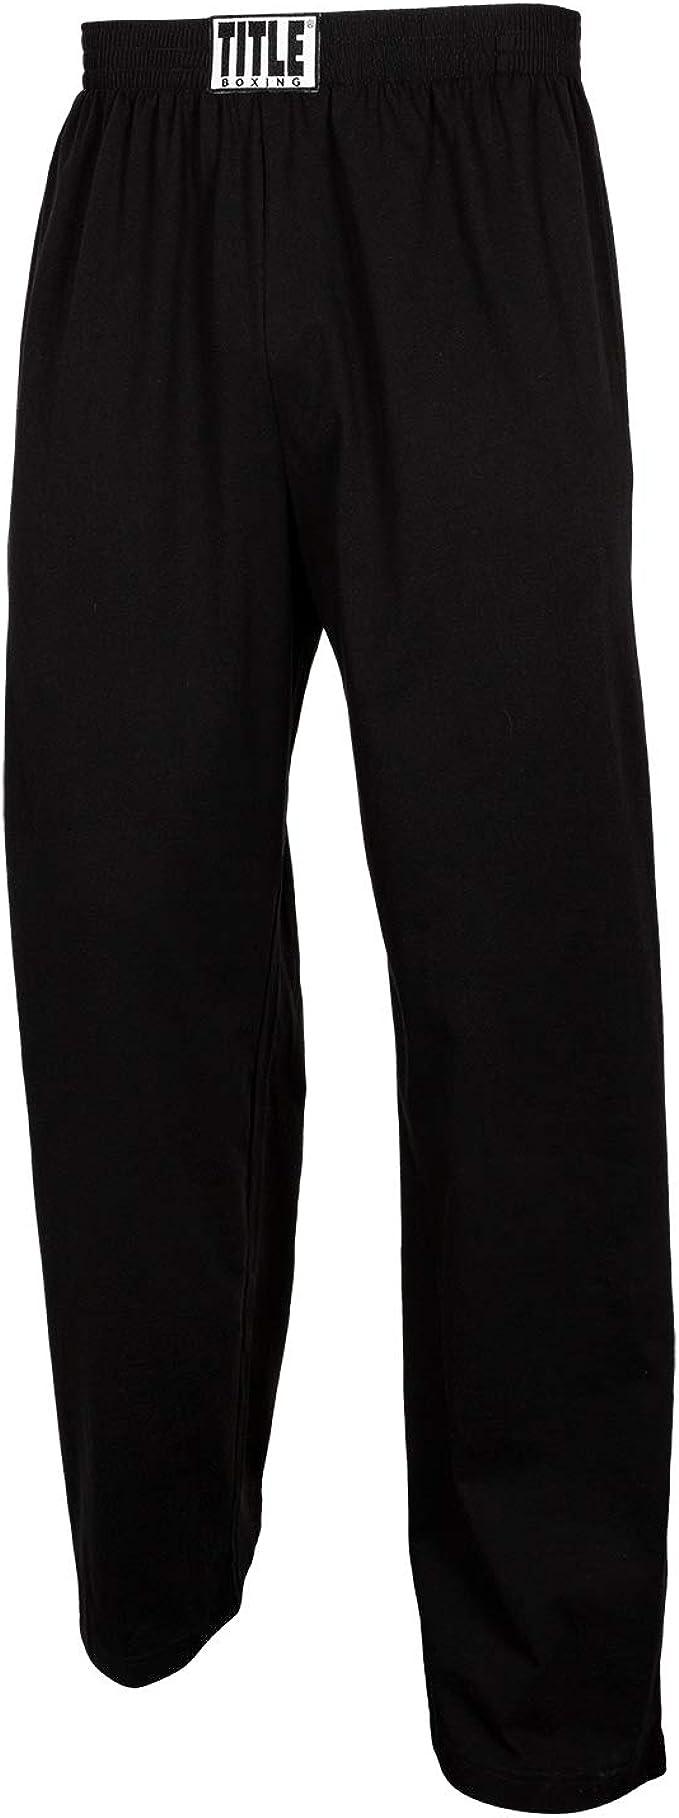 Title Boxing Cotton Jersey Pants